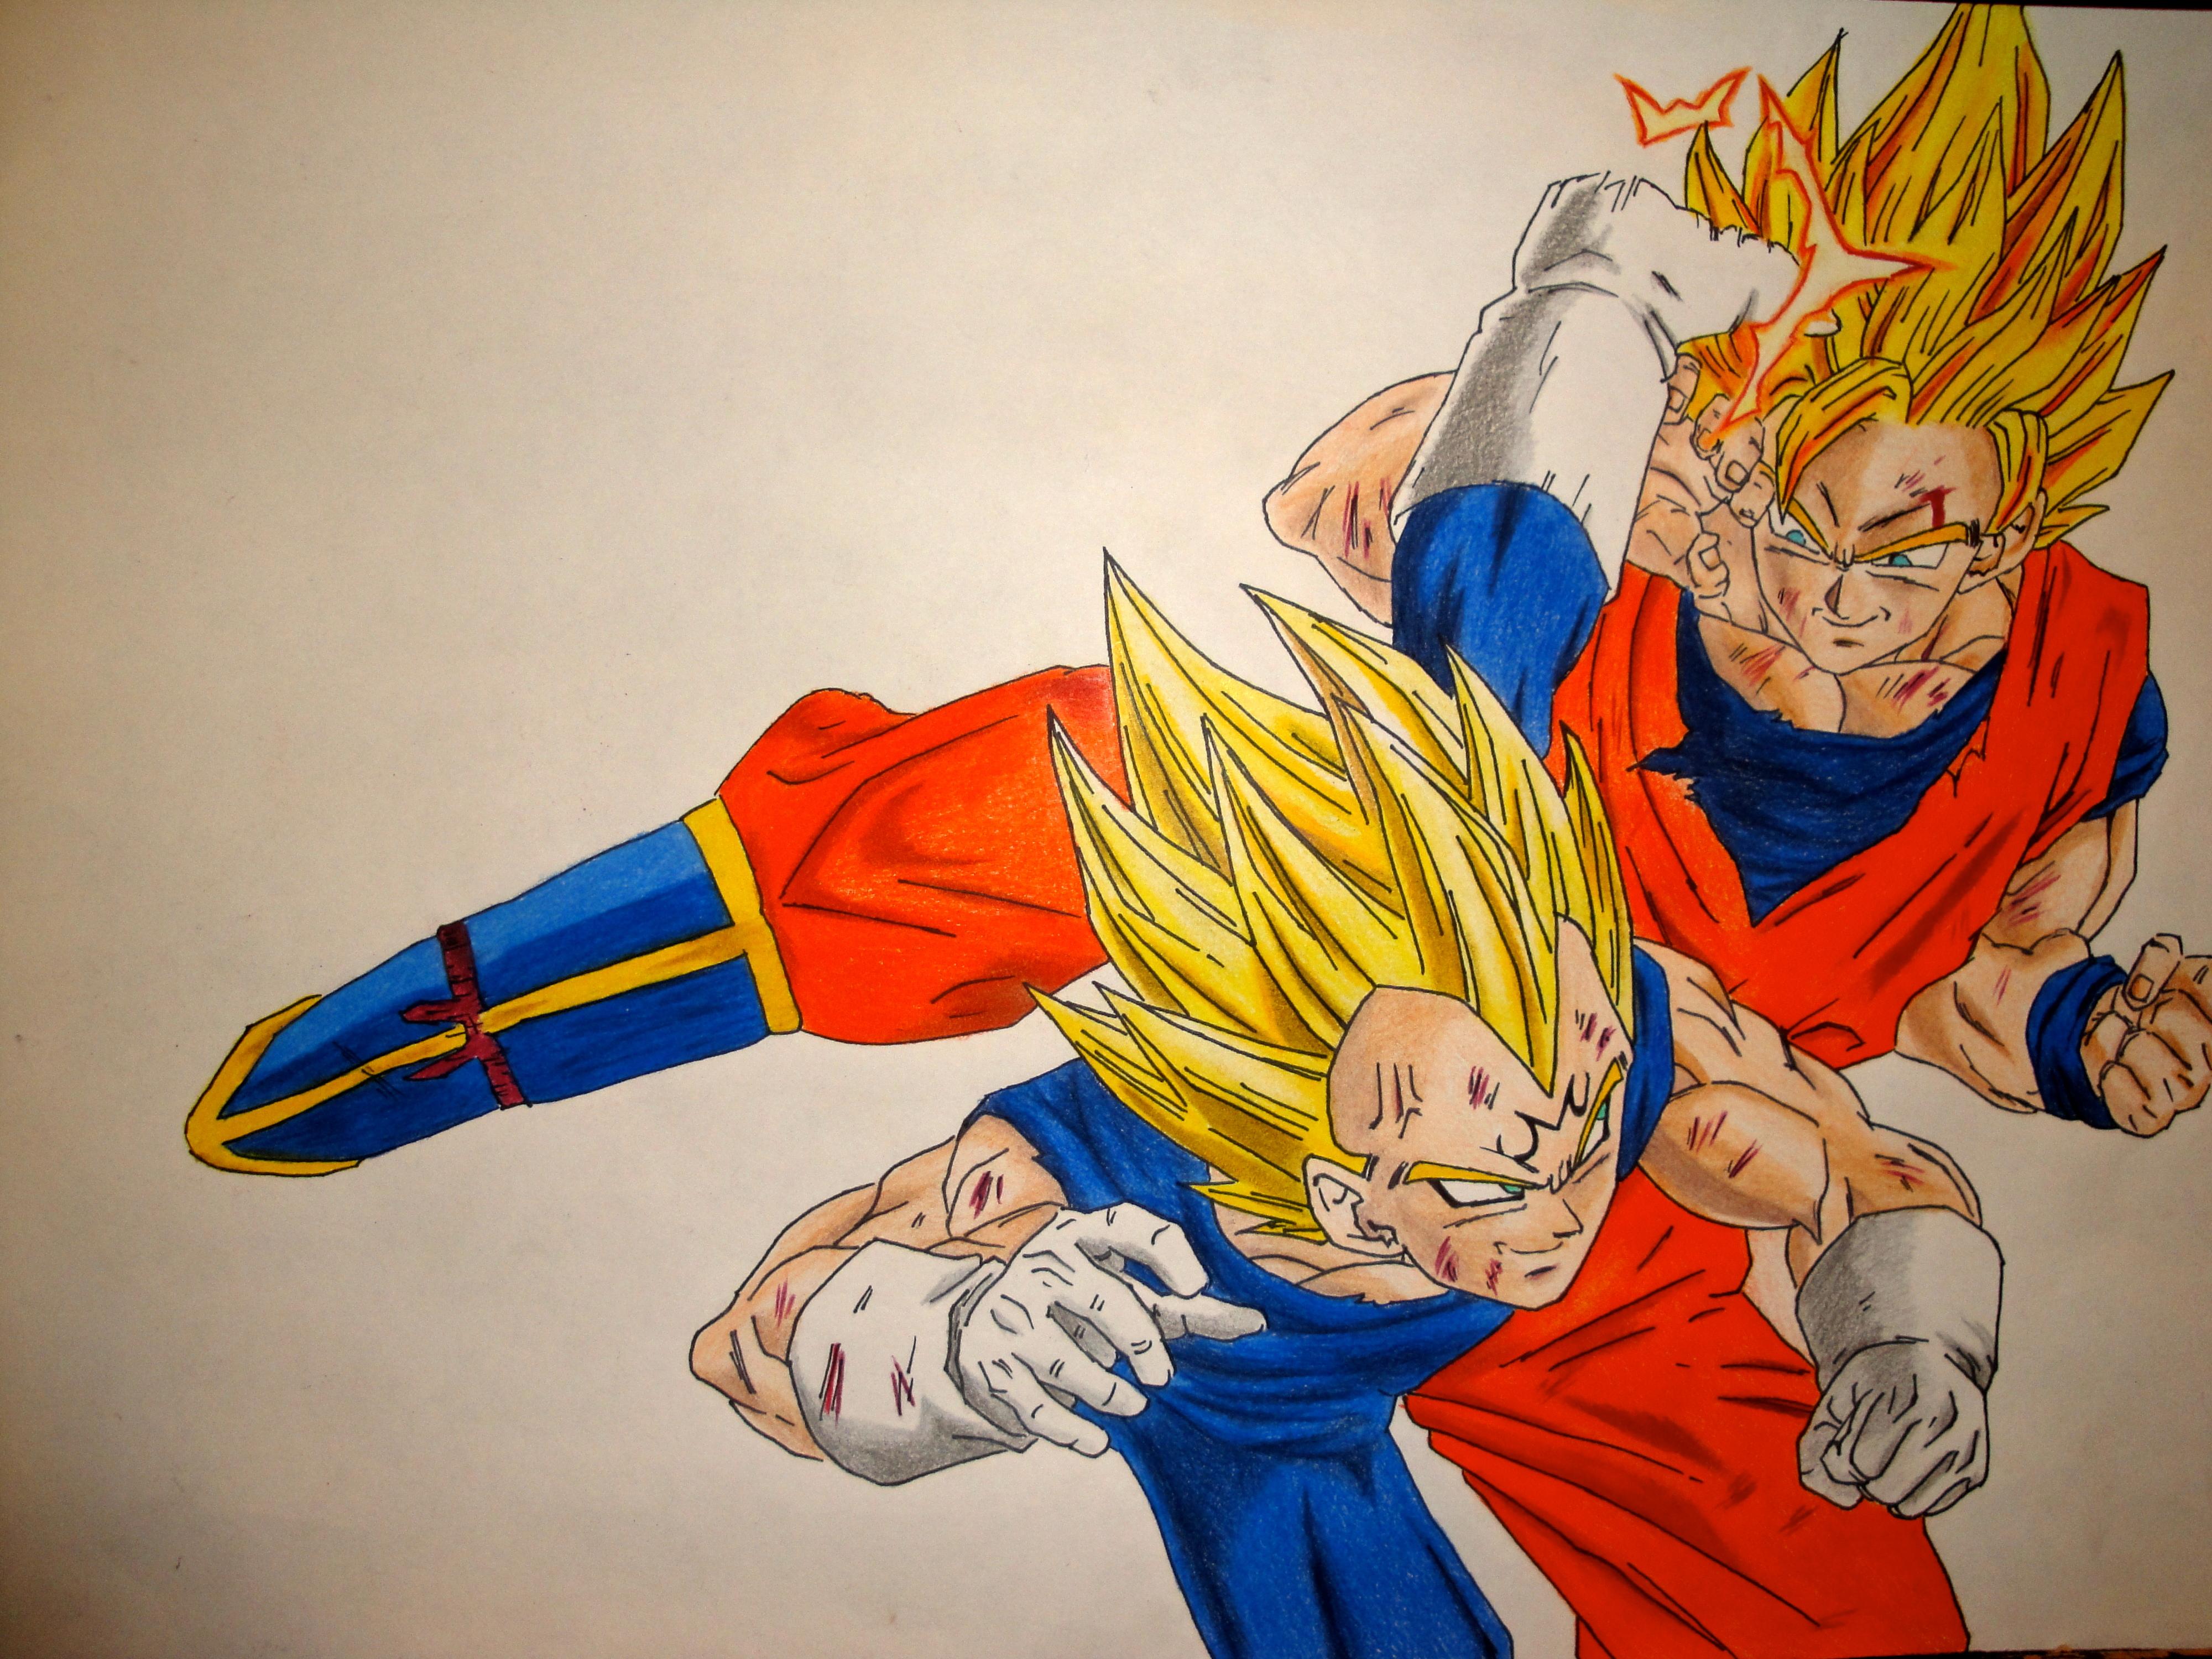 Goku Vs Vegeta HD Wallpaper Animation Wallpapers 4000x3000